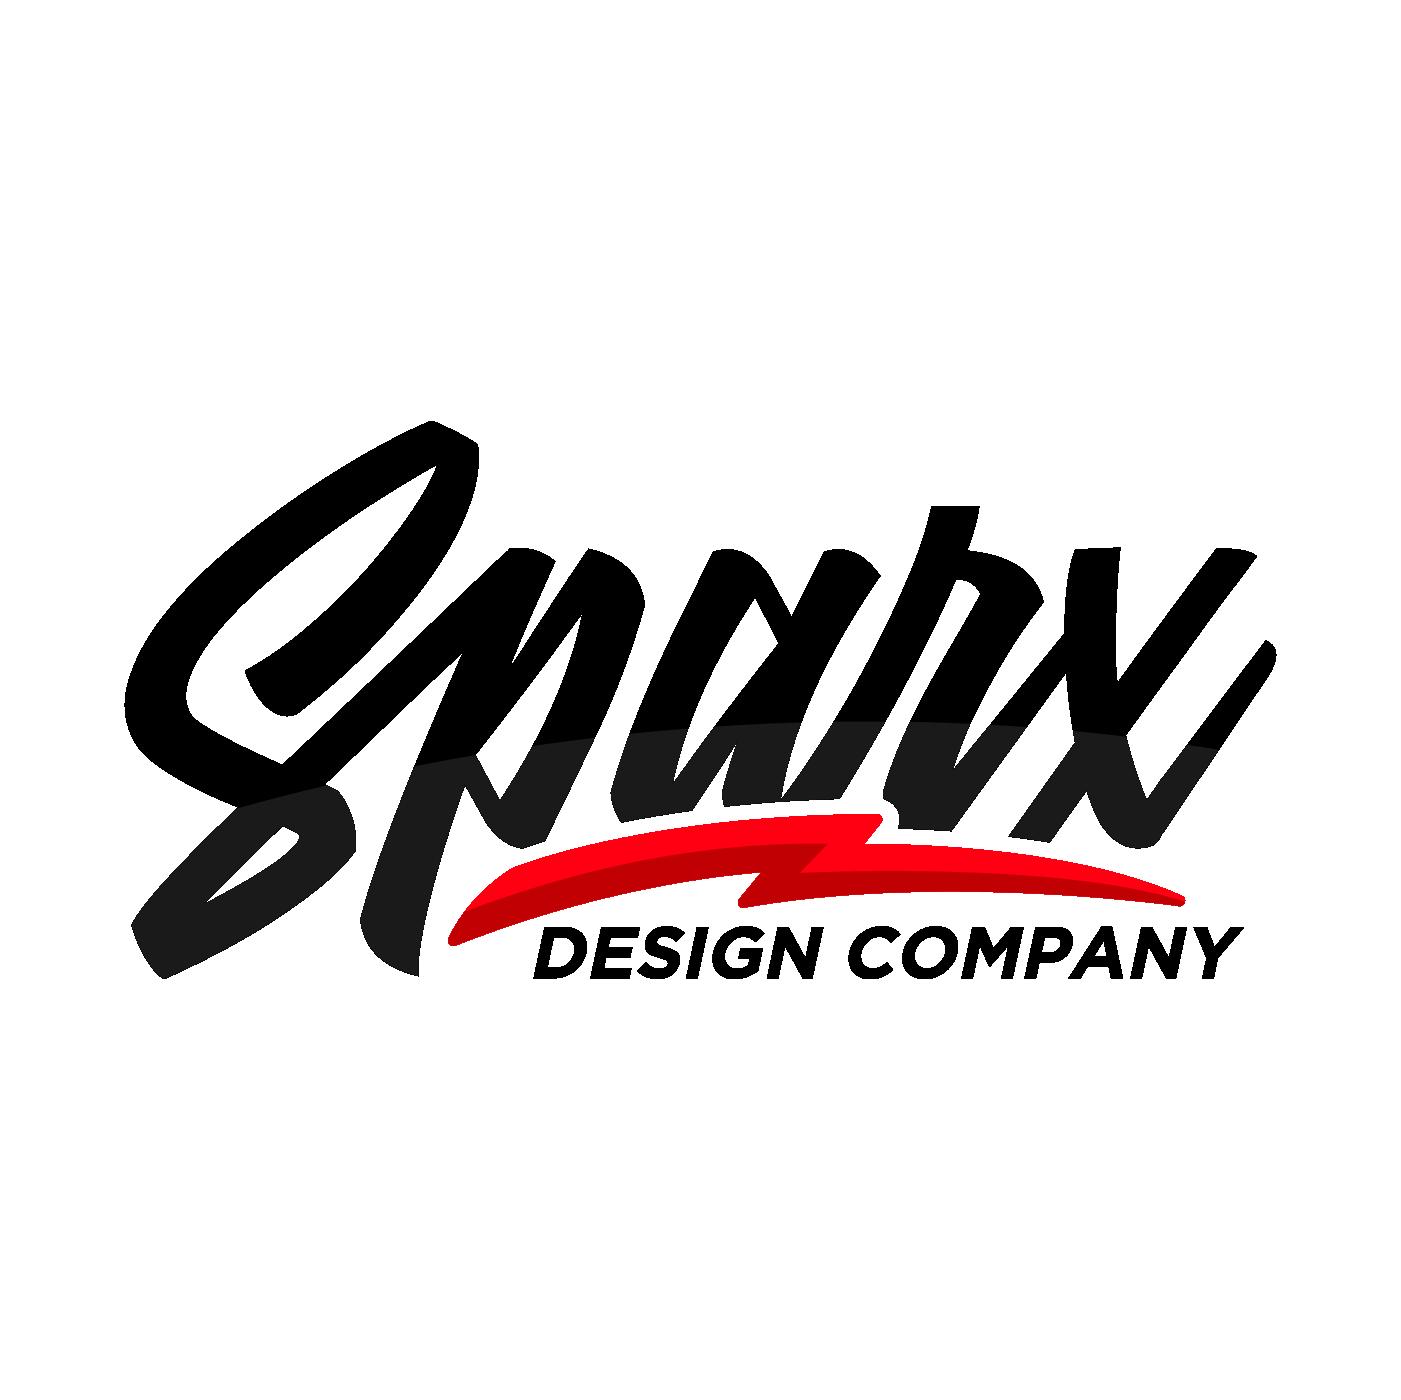 Sparx Design Company image